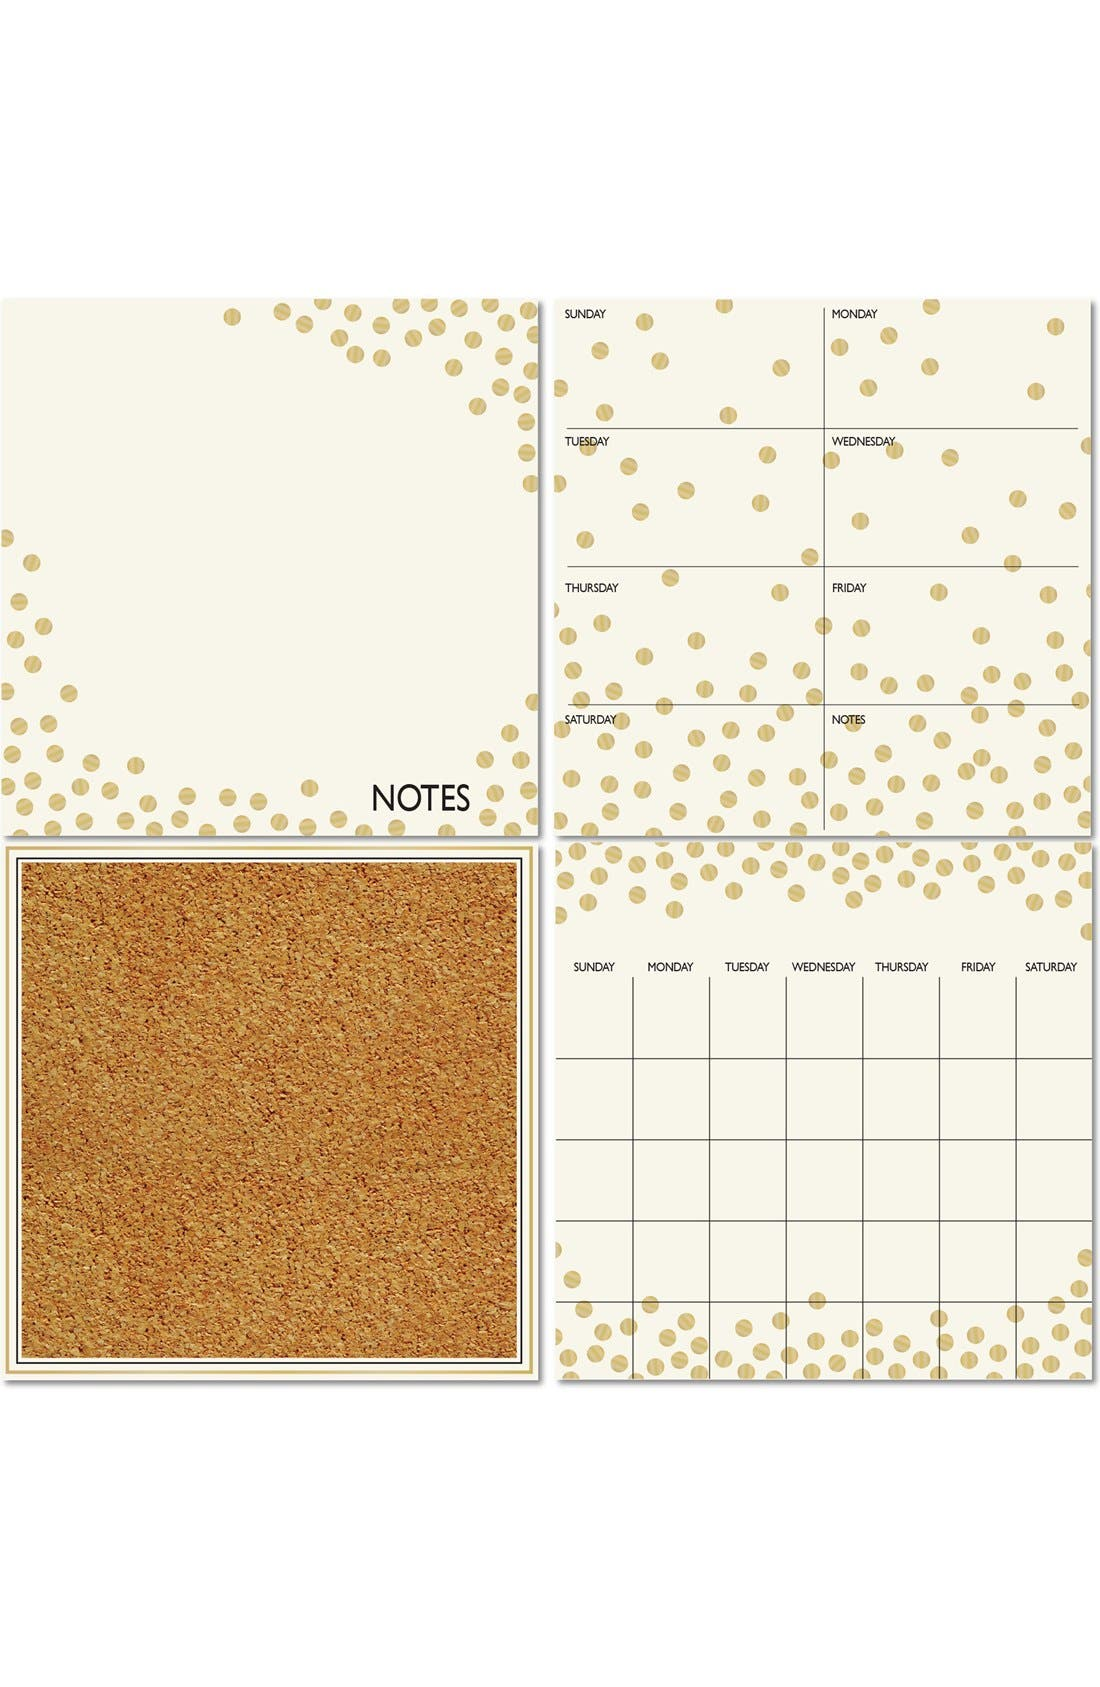 Main Image - Wallpops 'Confetti' Wall Decal Organization Kit